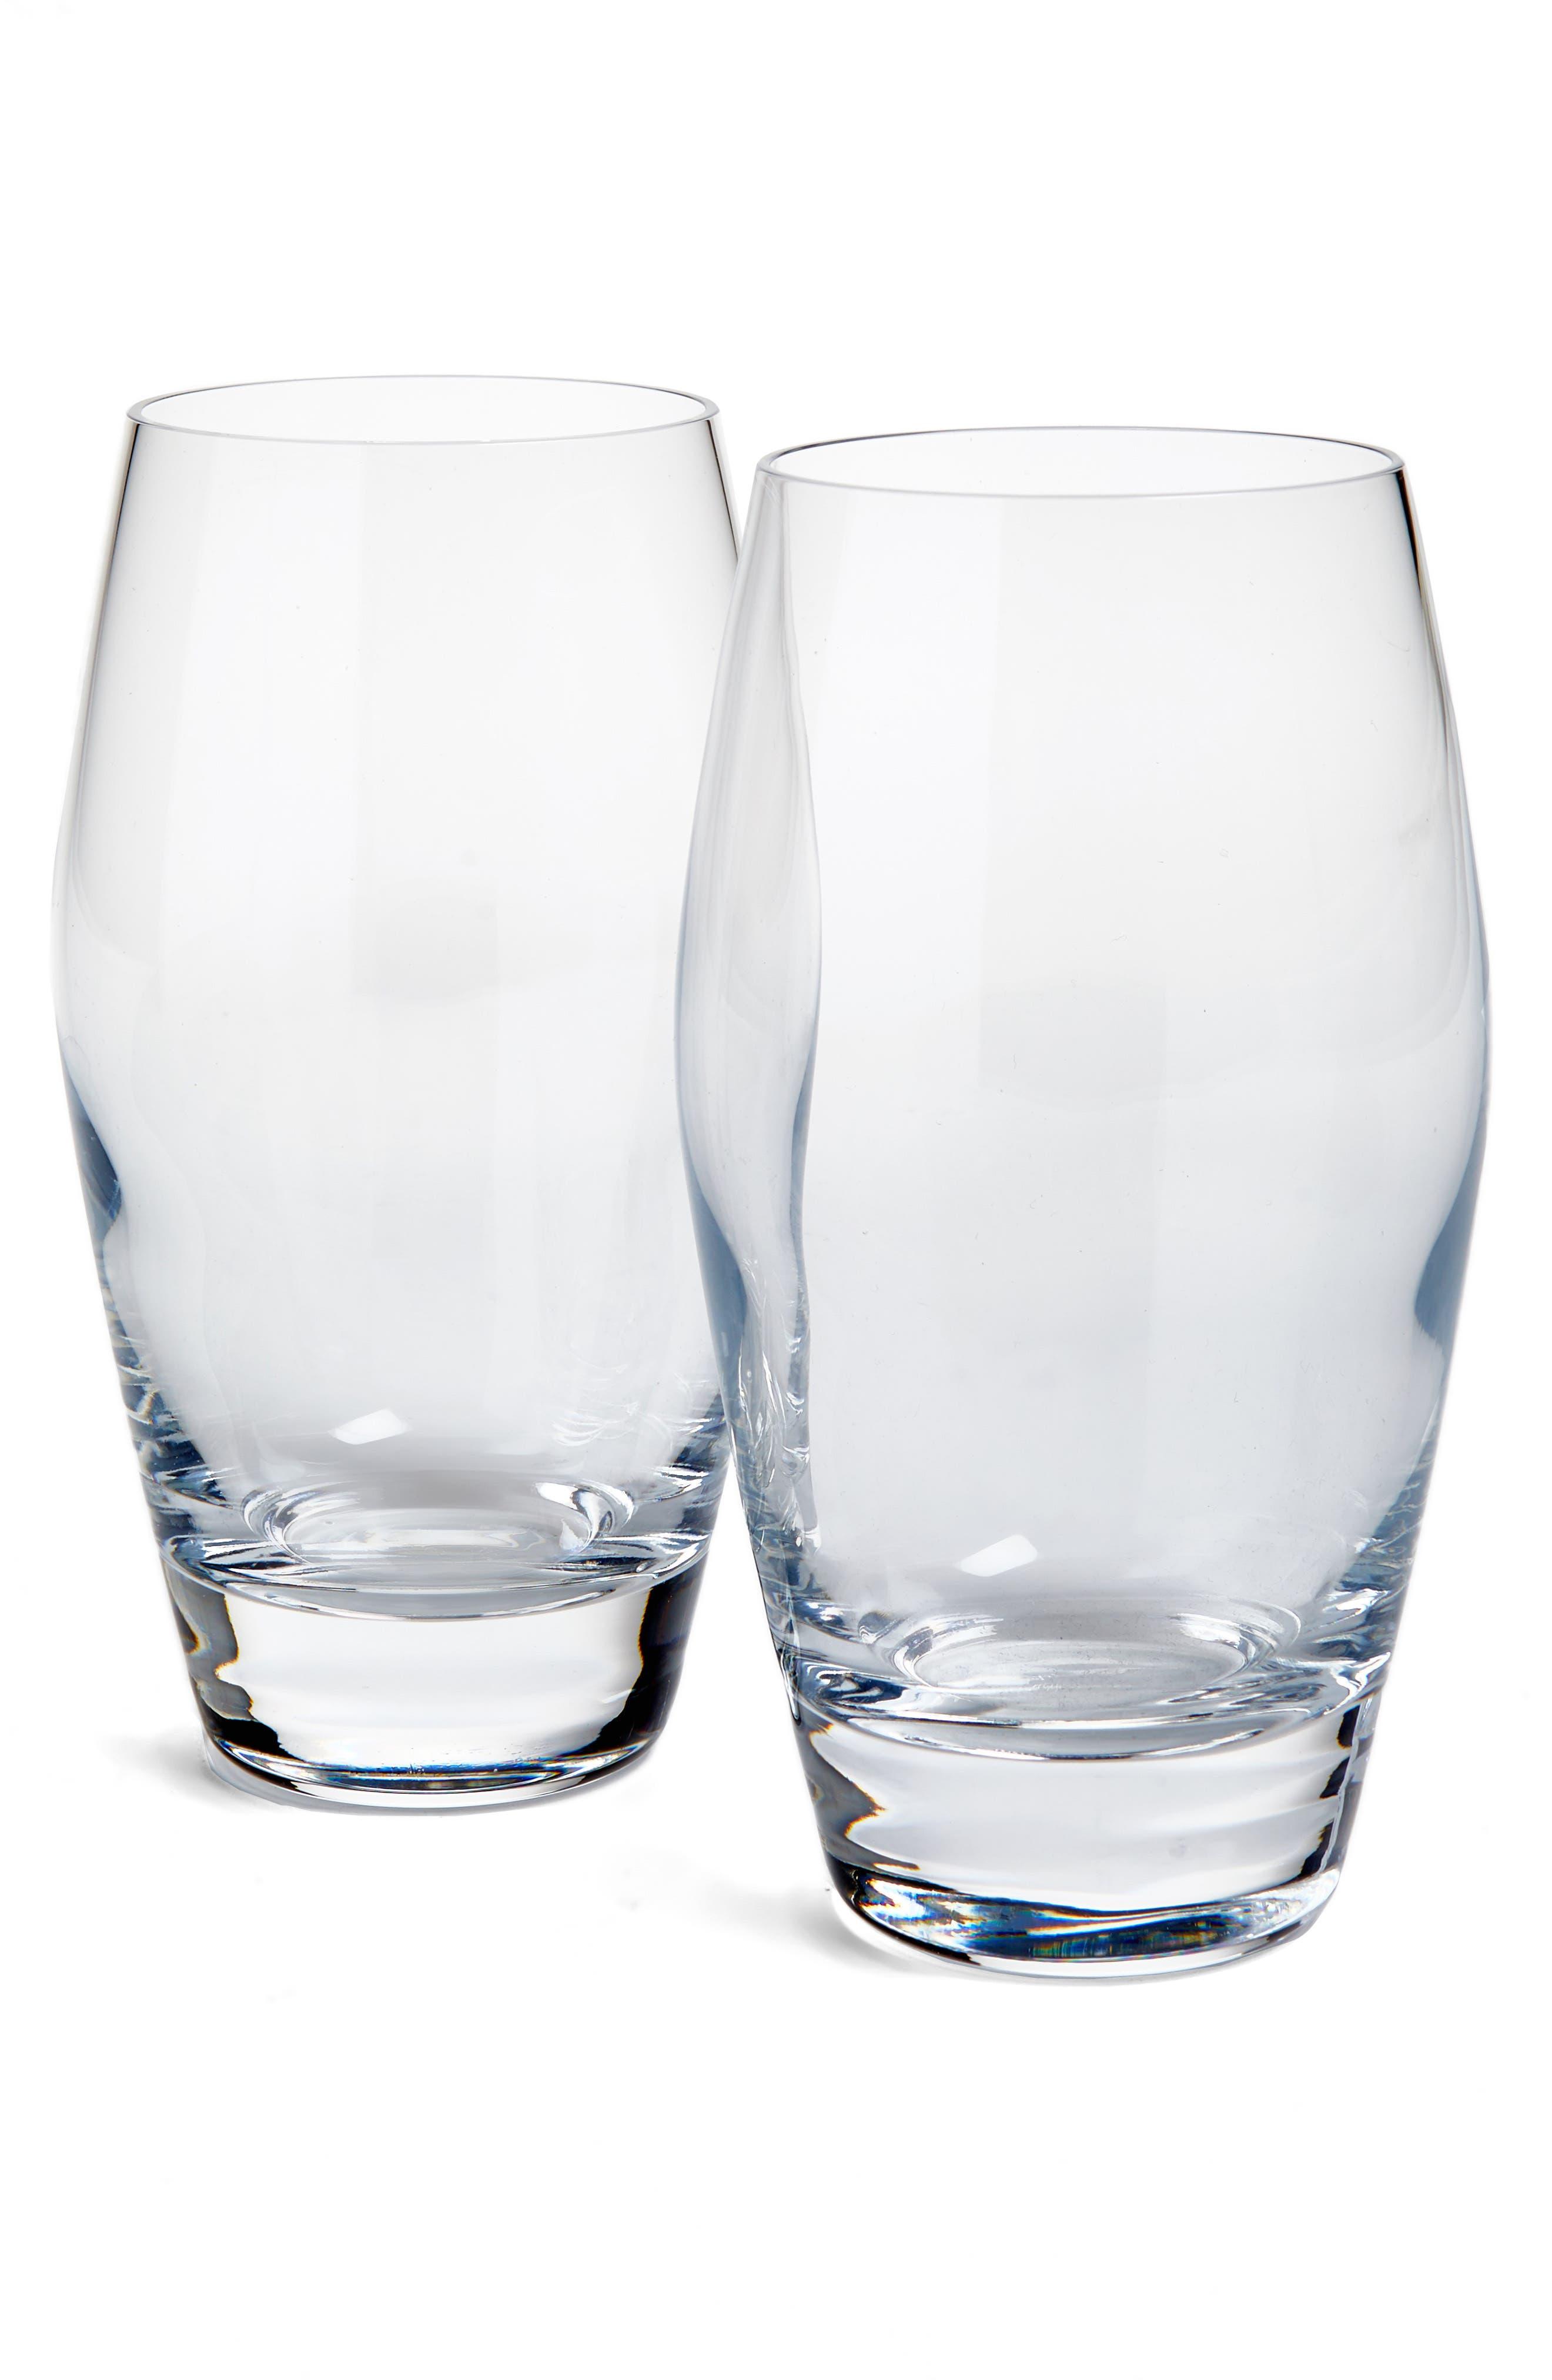 Alternate Image 1 Selected - Luigi Bormioli Classico Set of 4 Beverage Glasses